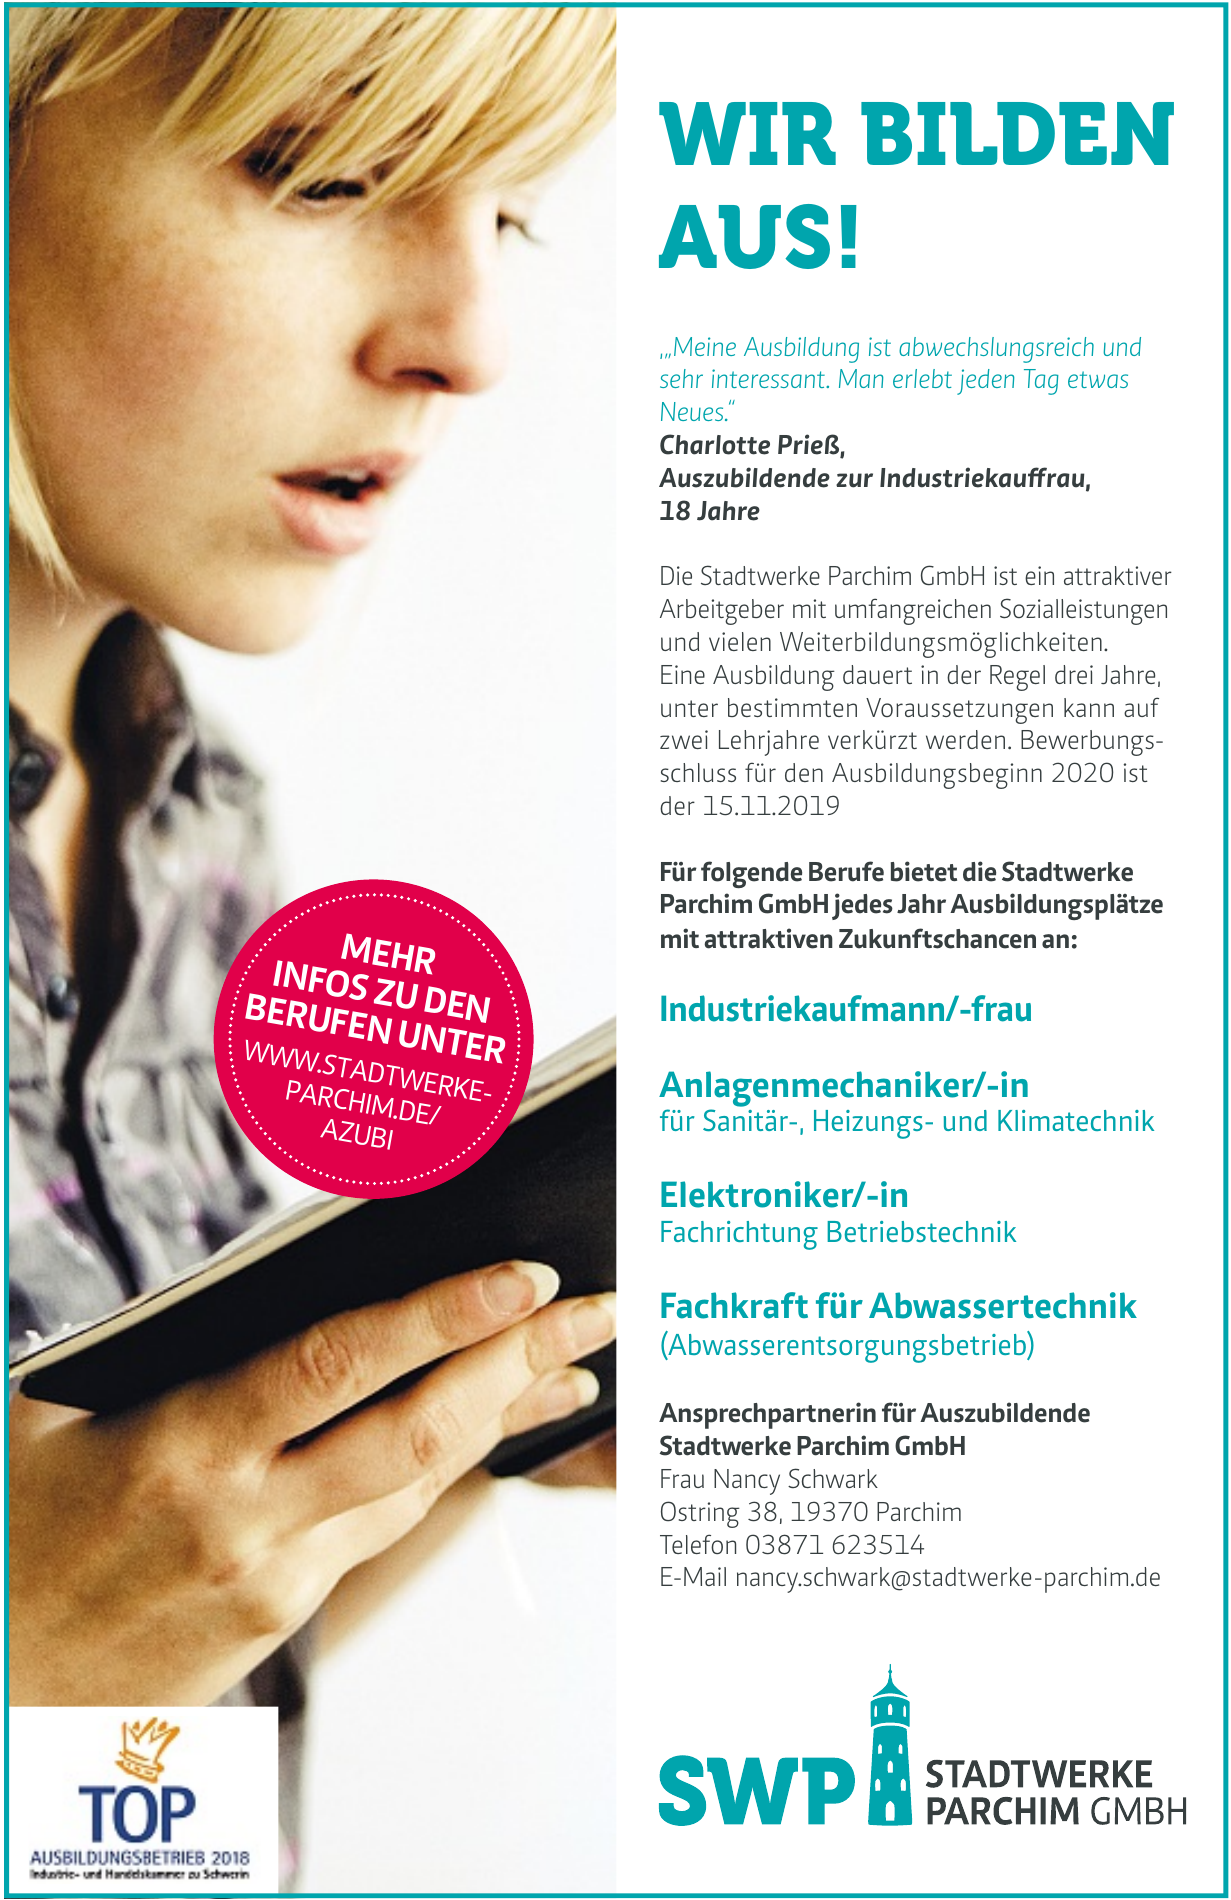 Stadtwerke Parchim GmbH